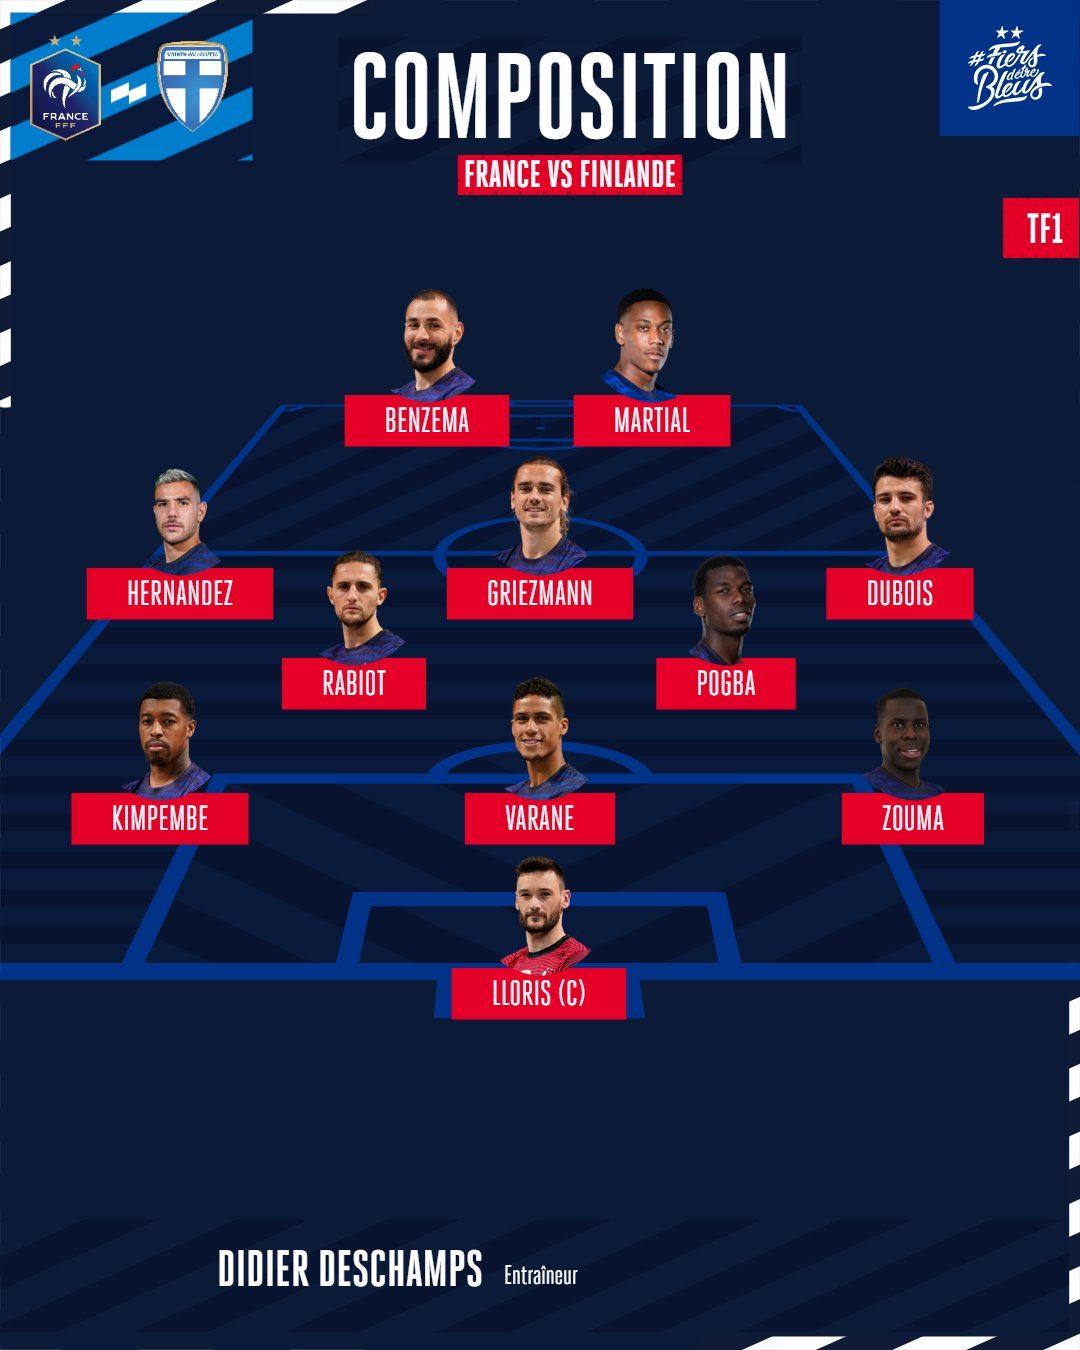 France formation